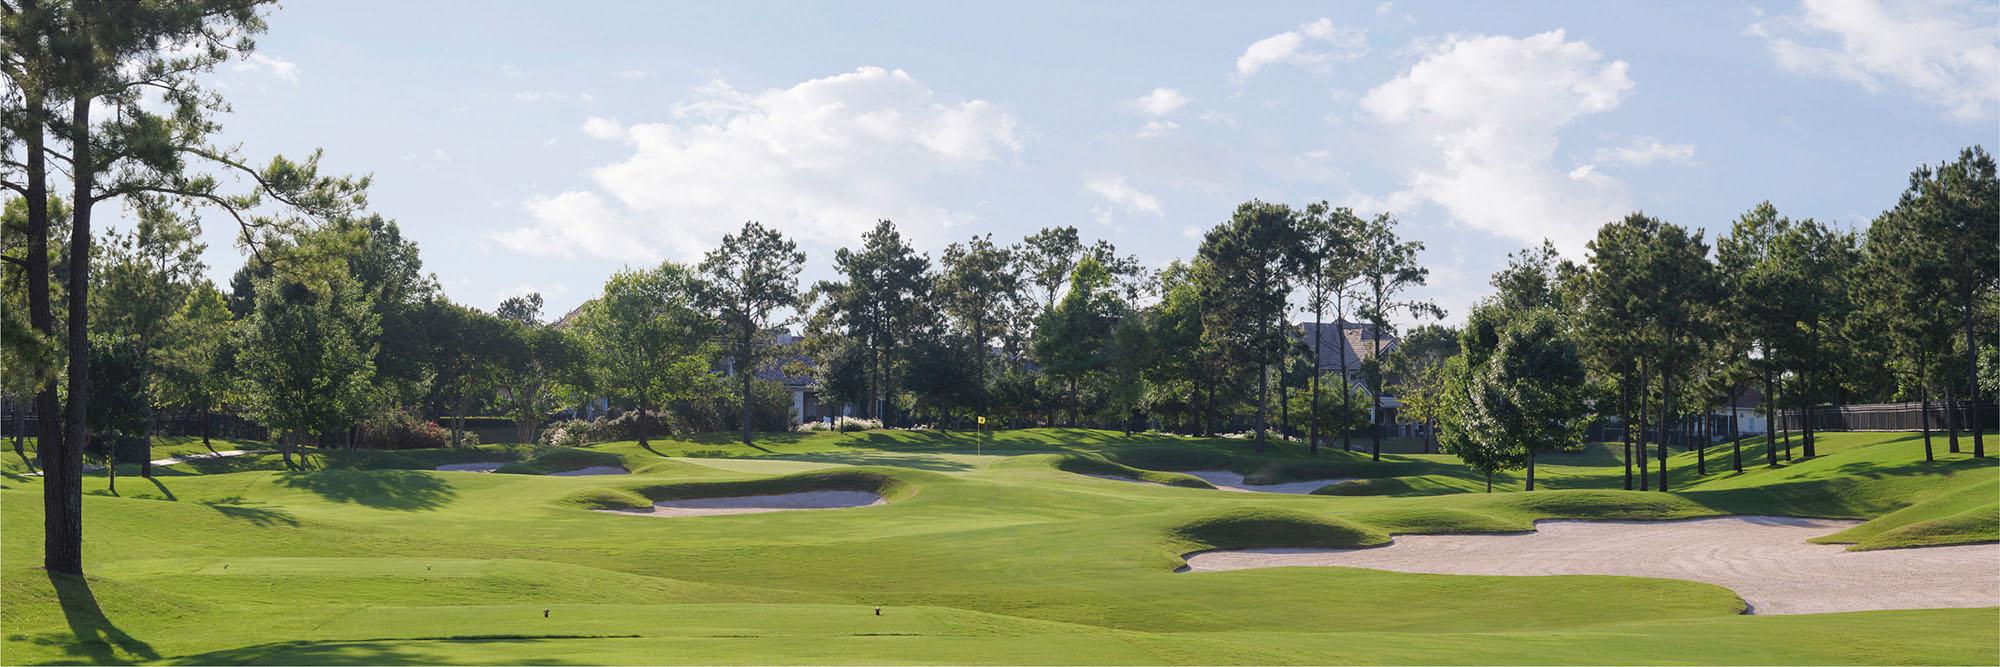 Golf Course Image - Royal Oaks No. 8